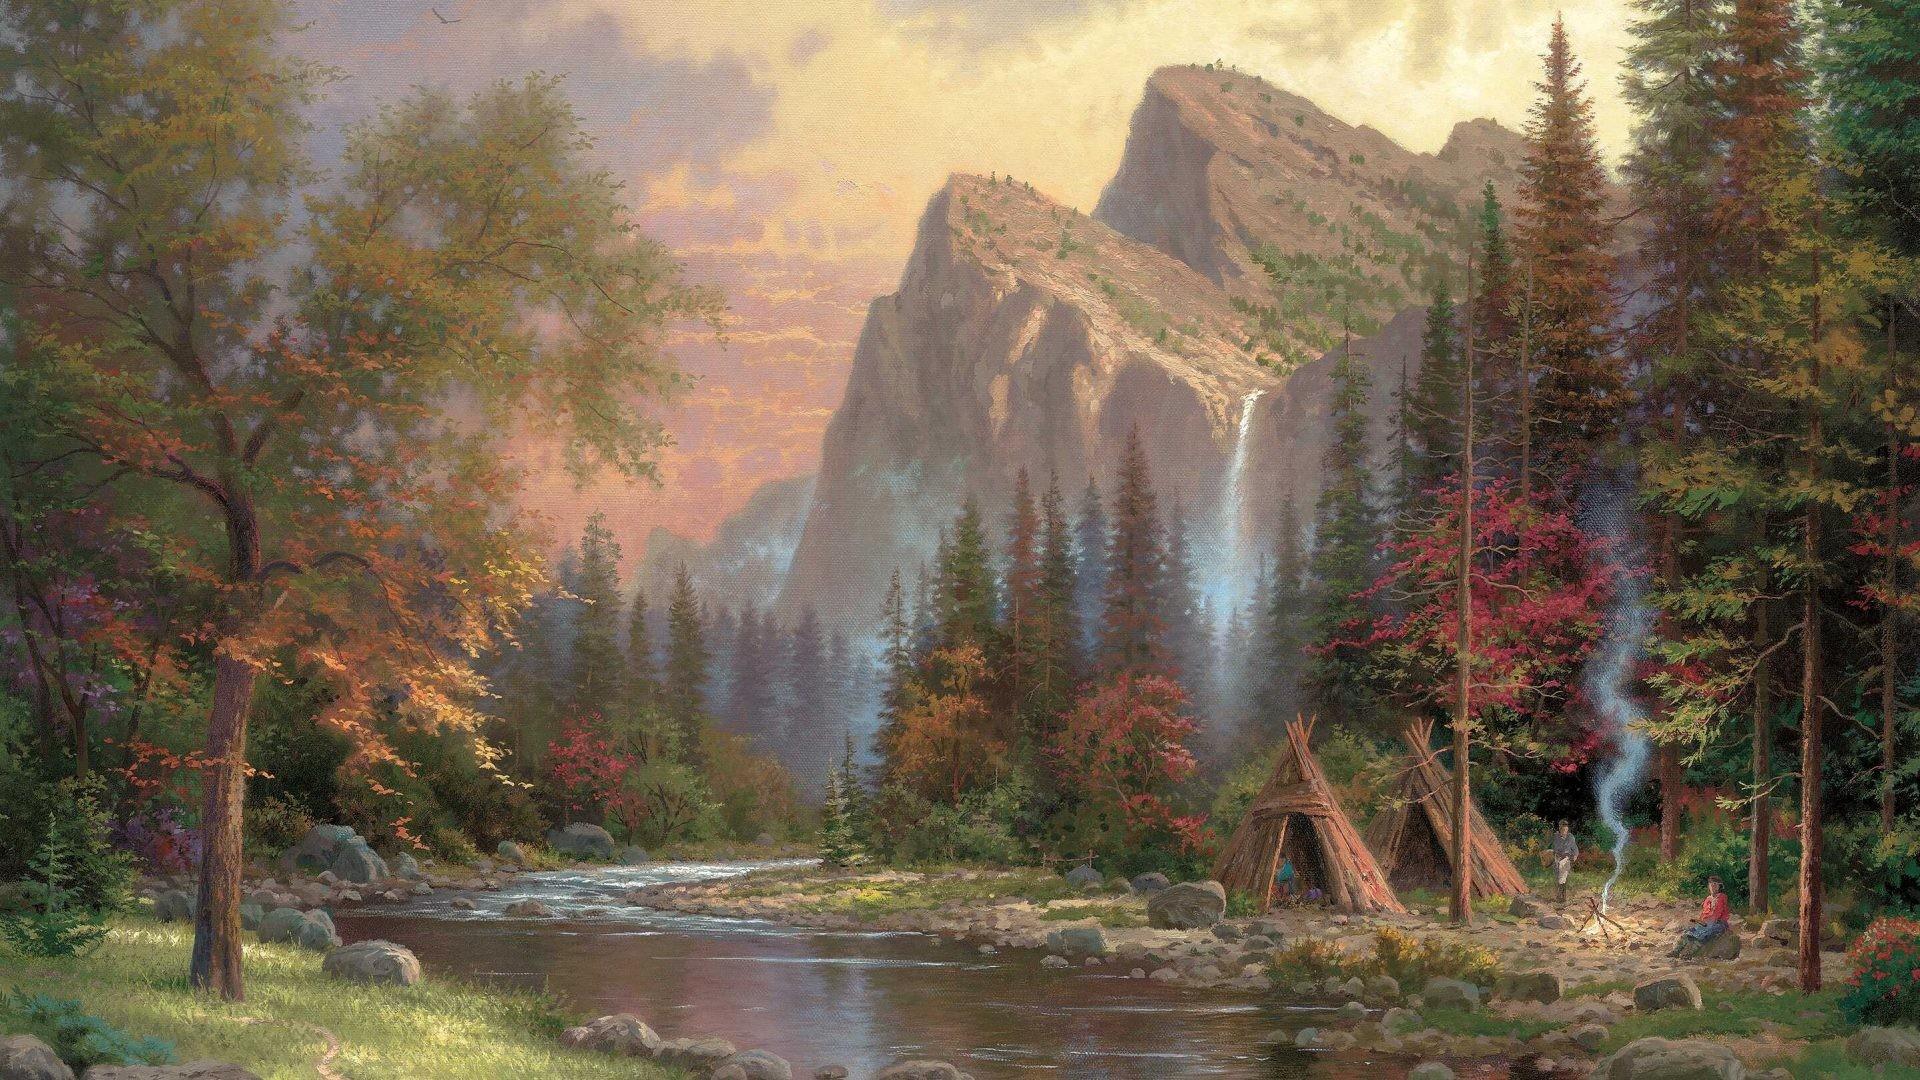 Kinkade Tag – Mountains Declare Glory Thomas Kinkade Fire Sunset Waterfalls  Painting Nature Smoke River Yurt